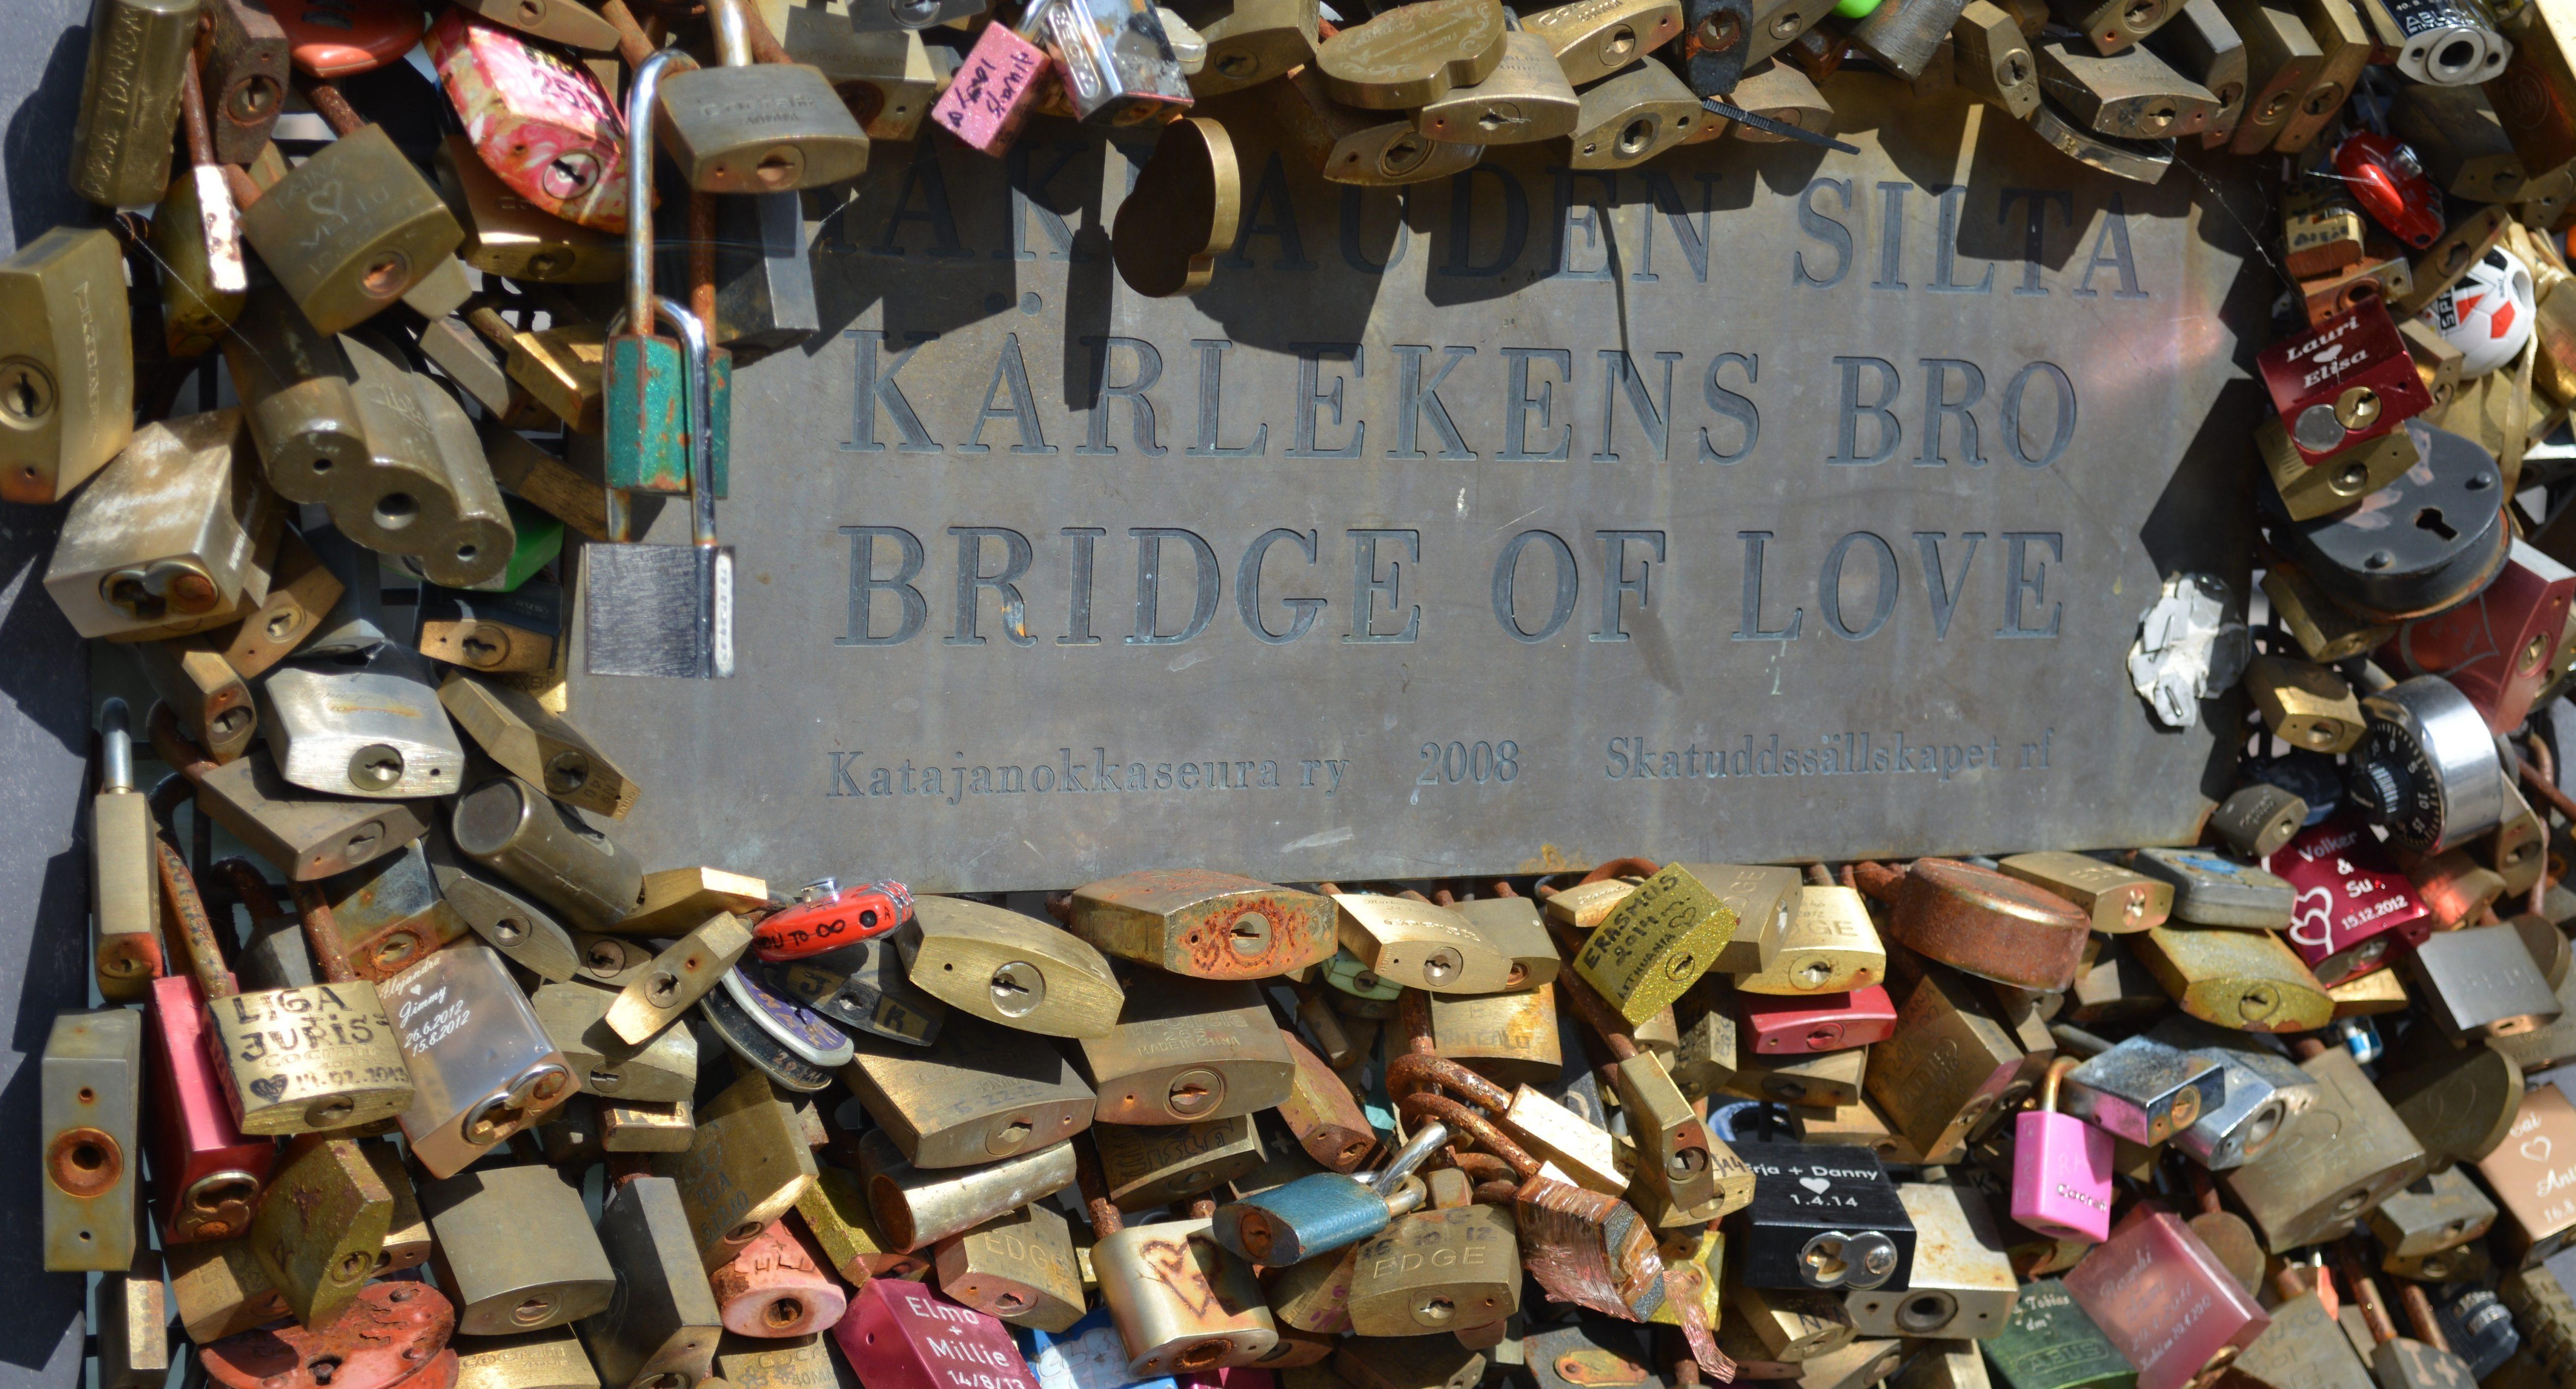 Fähre Stockholm-Helsinki Brücke der Liebe